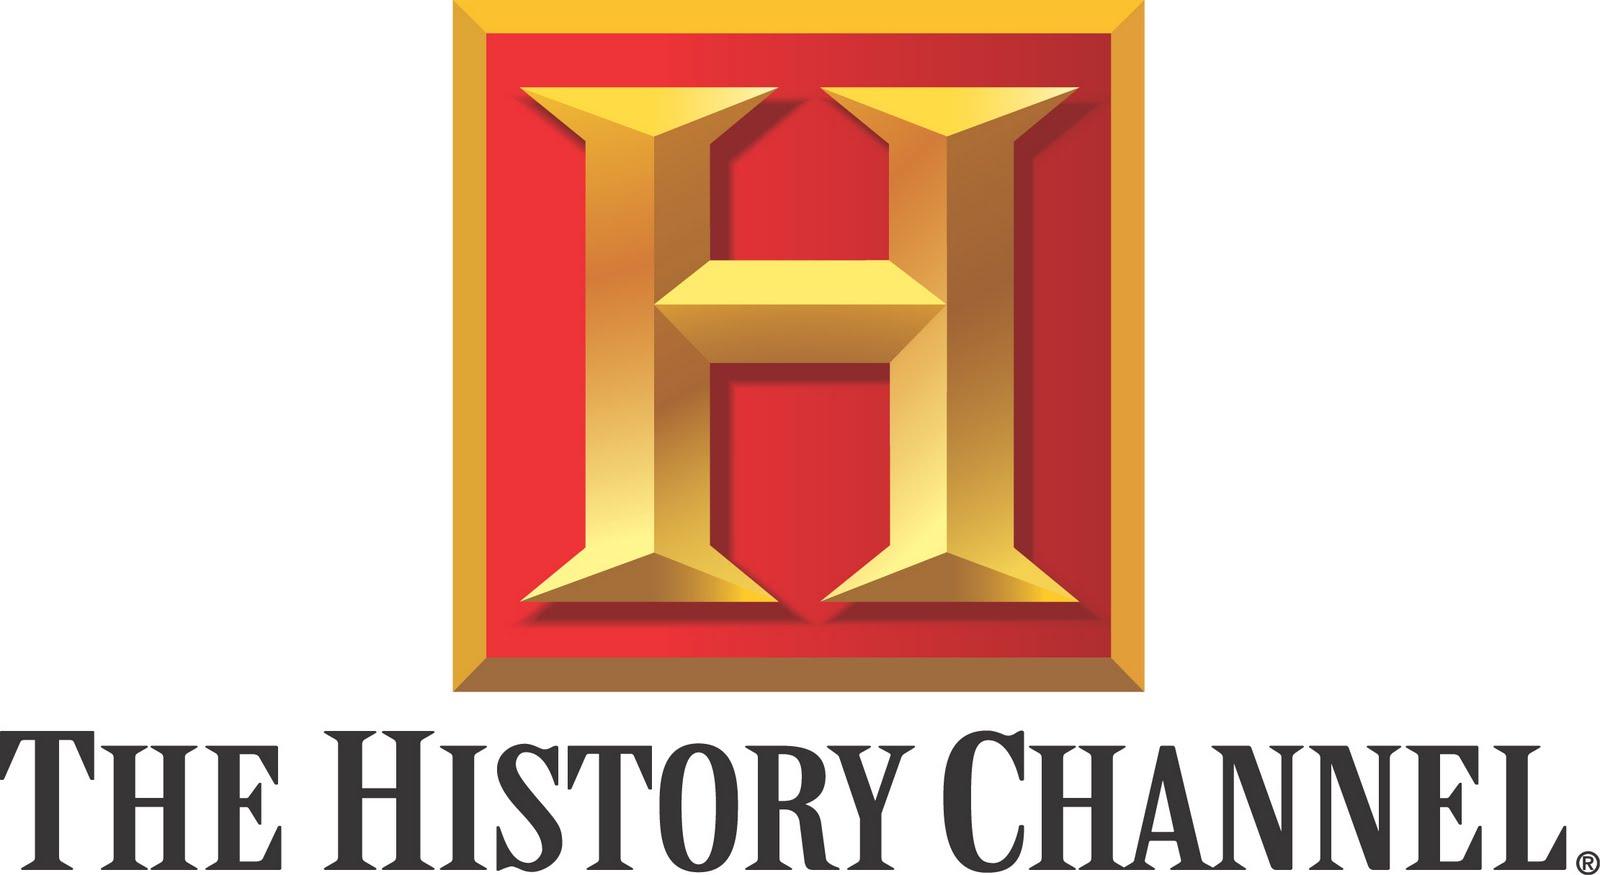 The History Channel logo.jpg